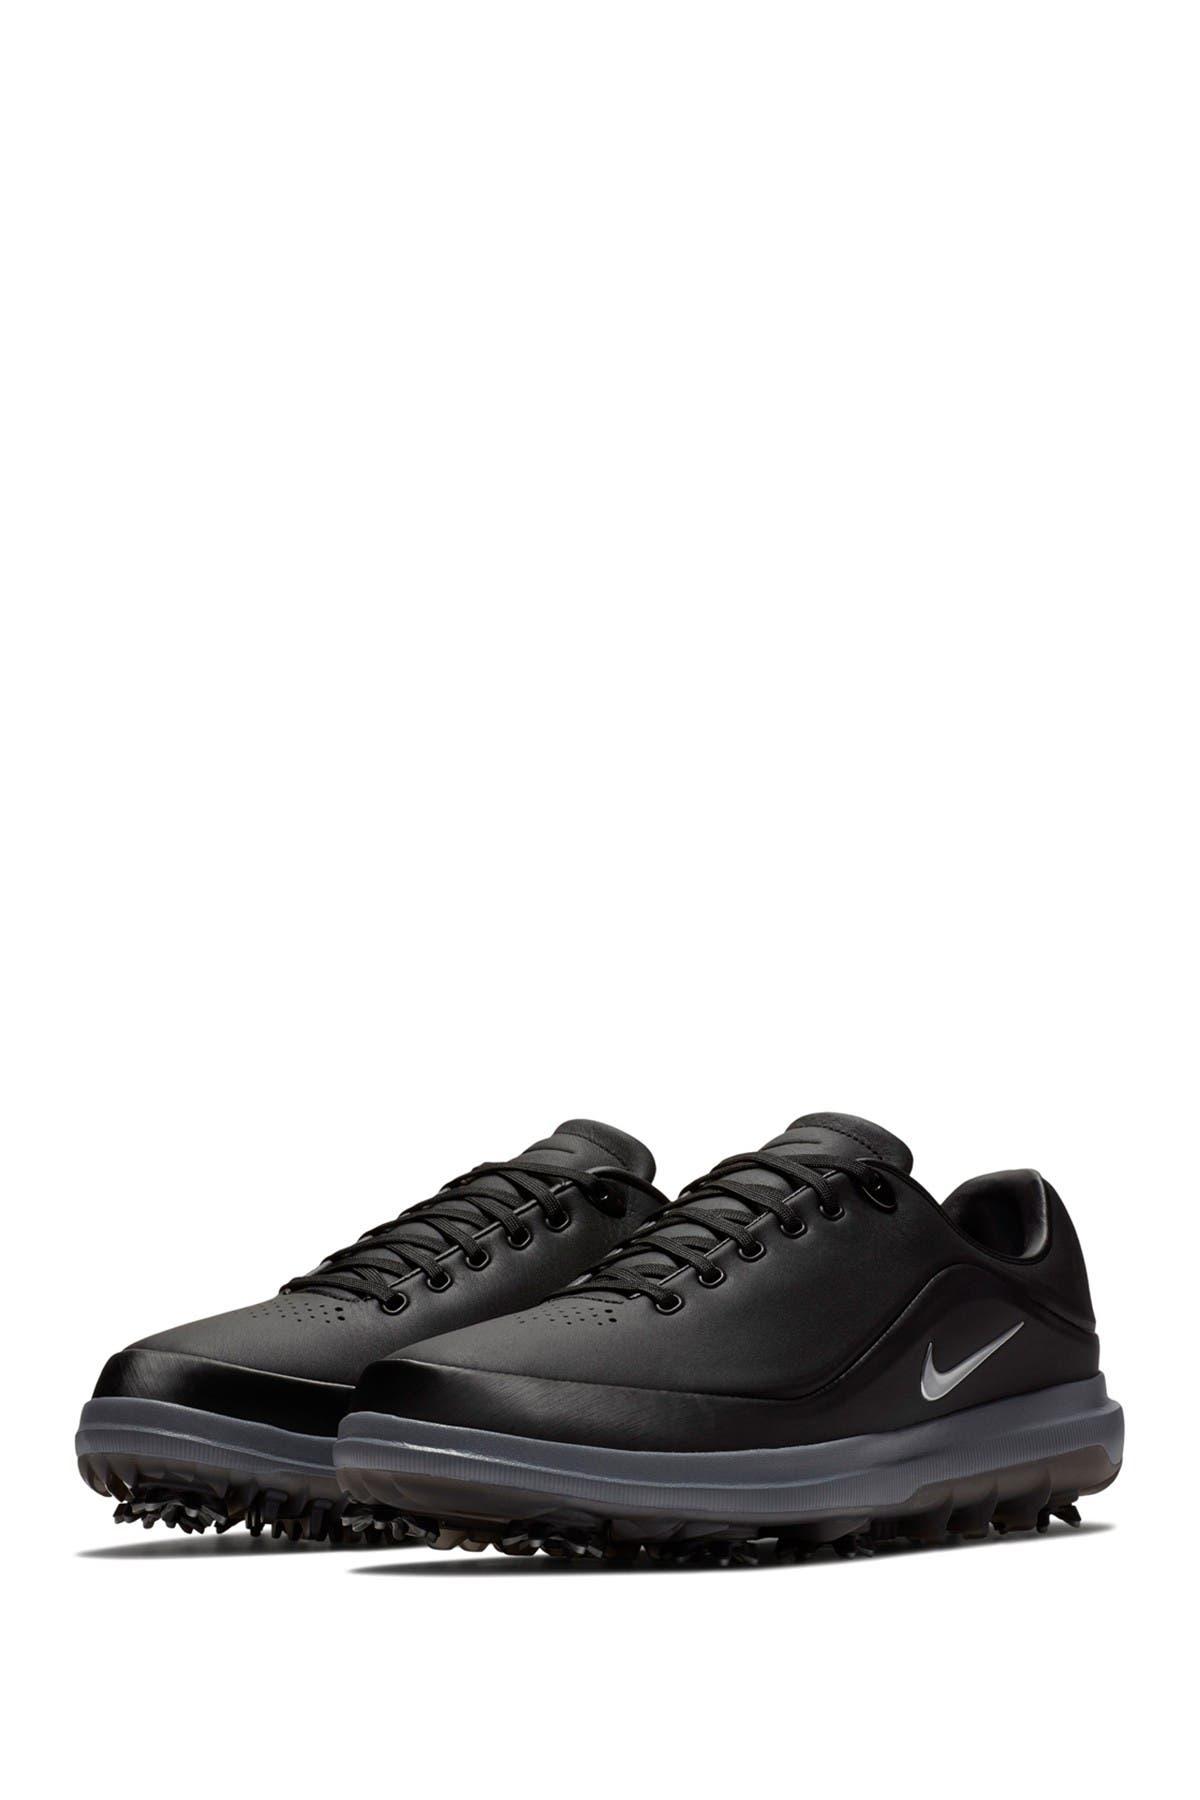 Air Zoom Precision Waterproof Golf Shoe